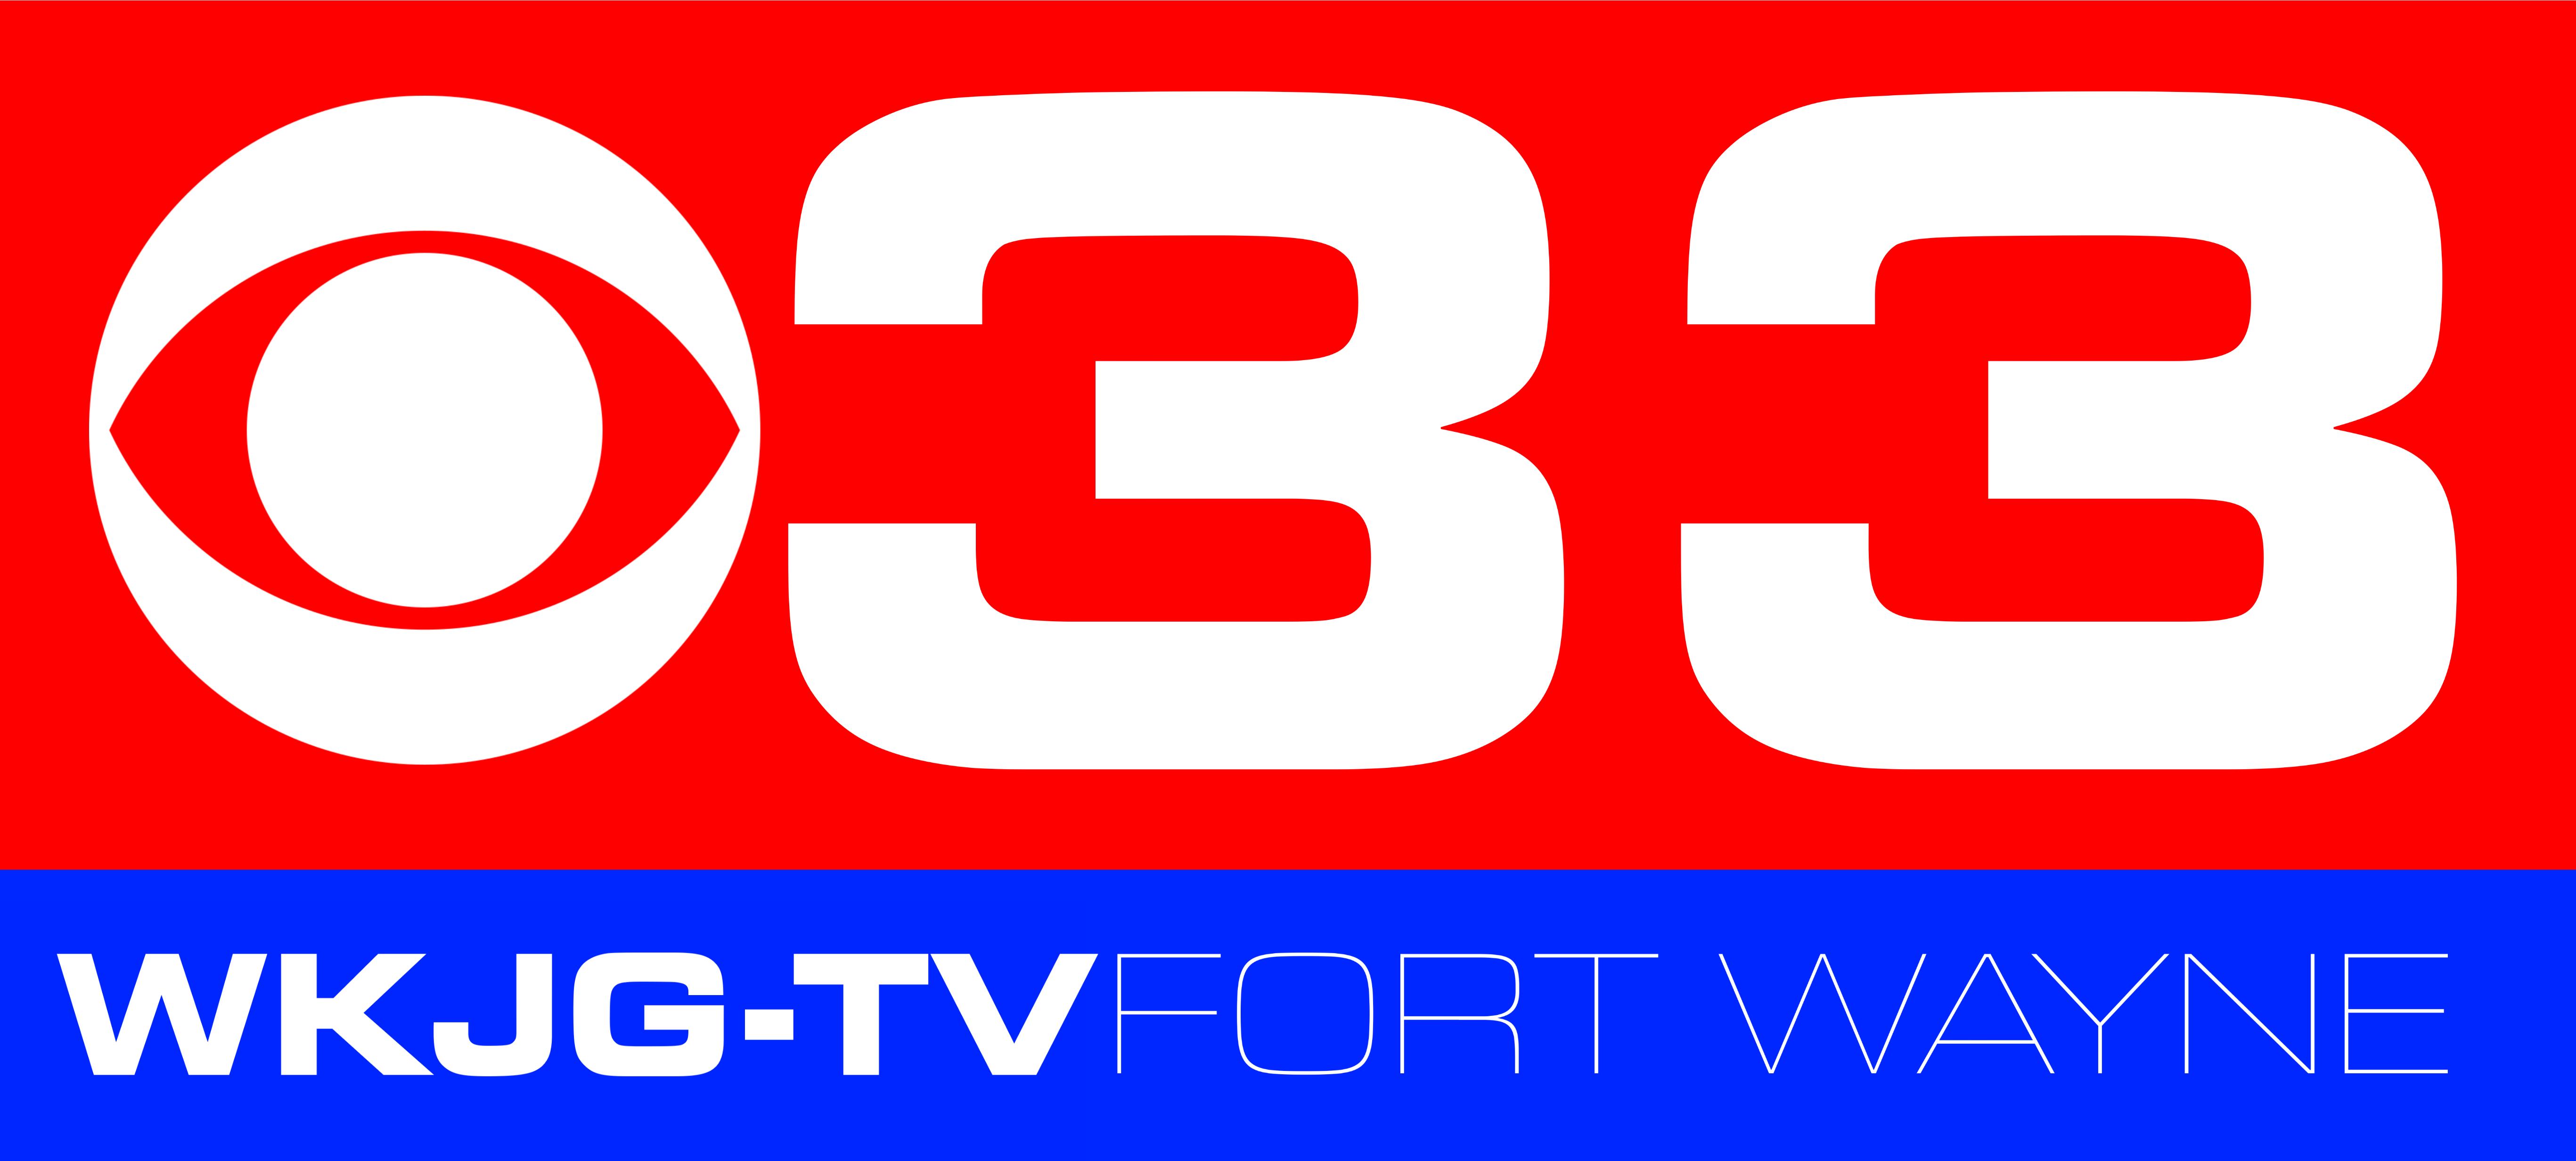 AlternateHistory.com's WKJG-TV logo #1.png